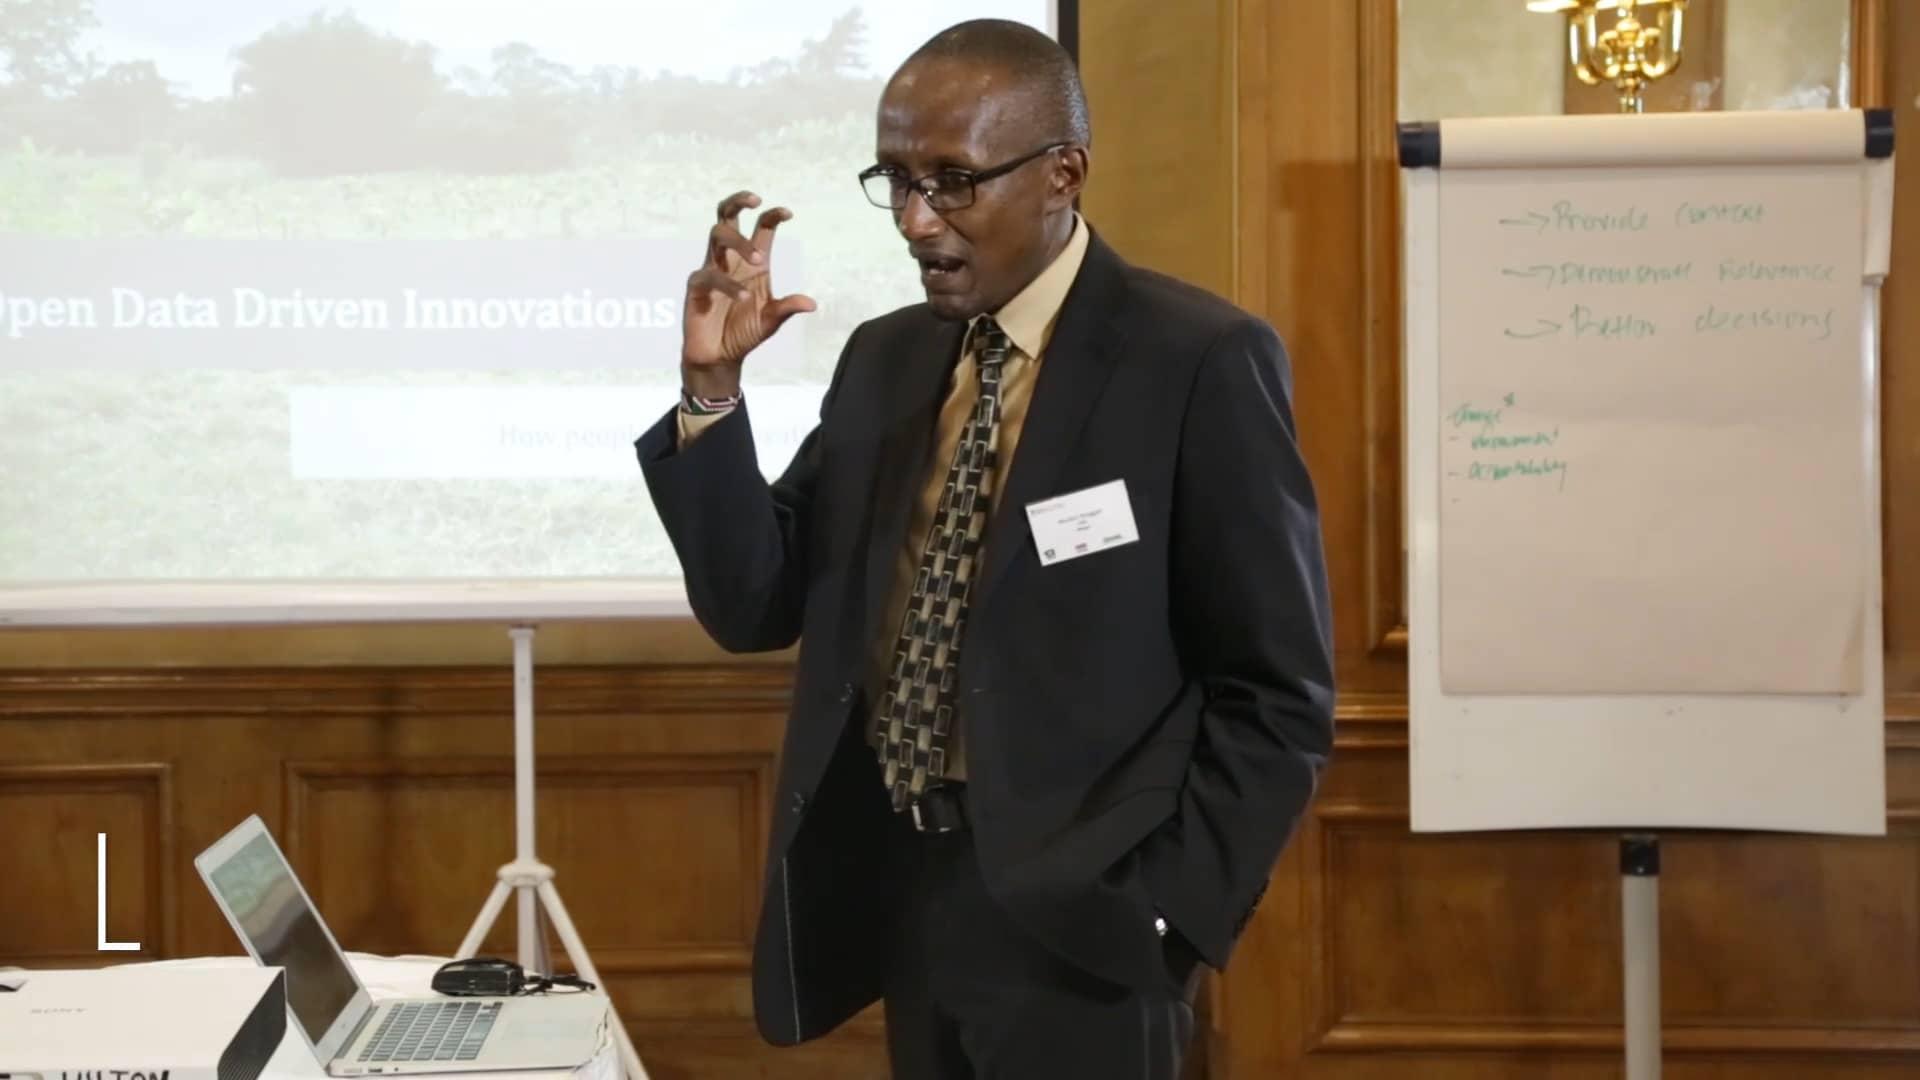 GODAN Action : Capacity Development for data-driven journalism in Africa